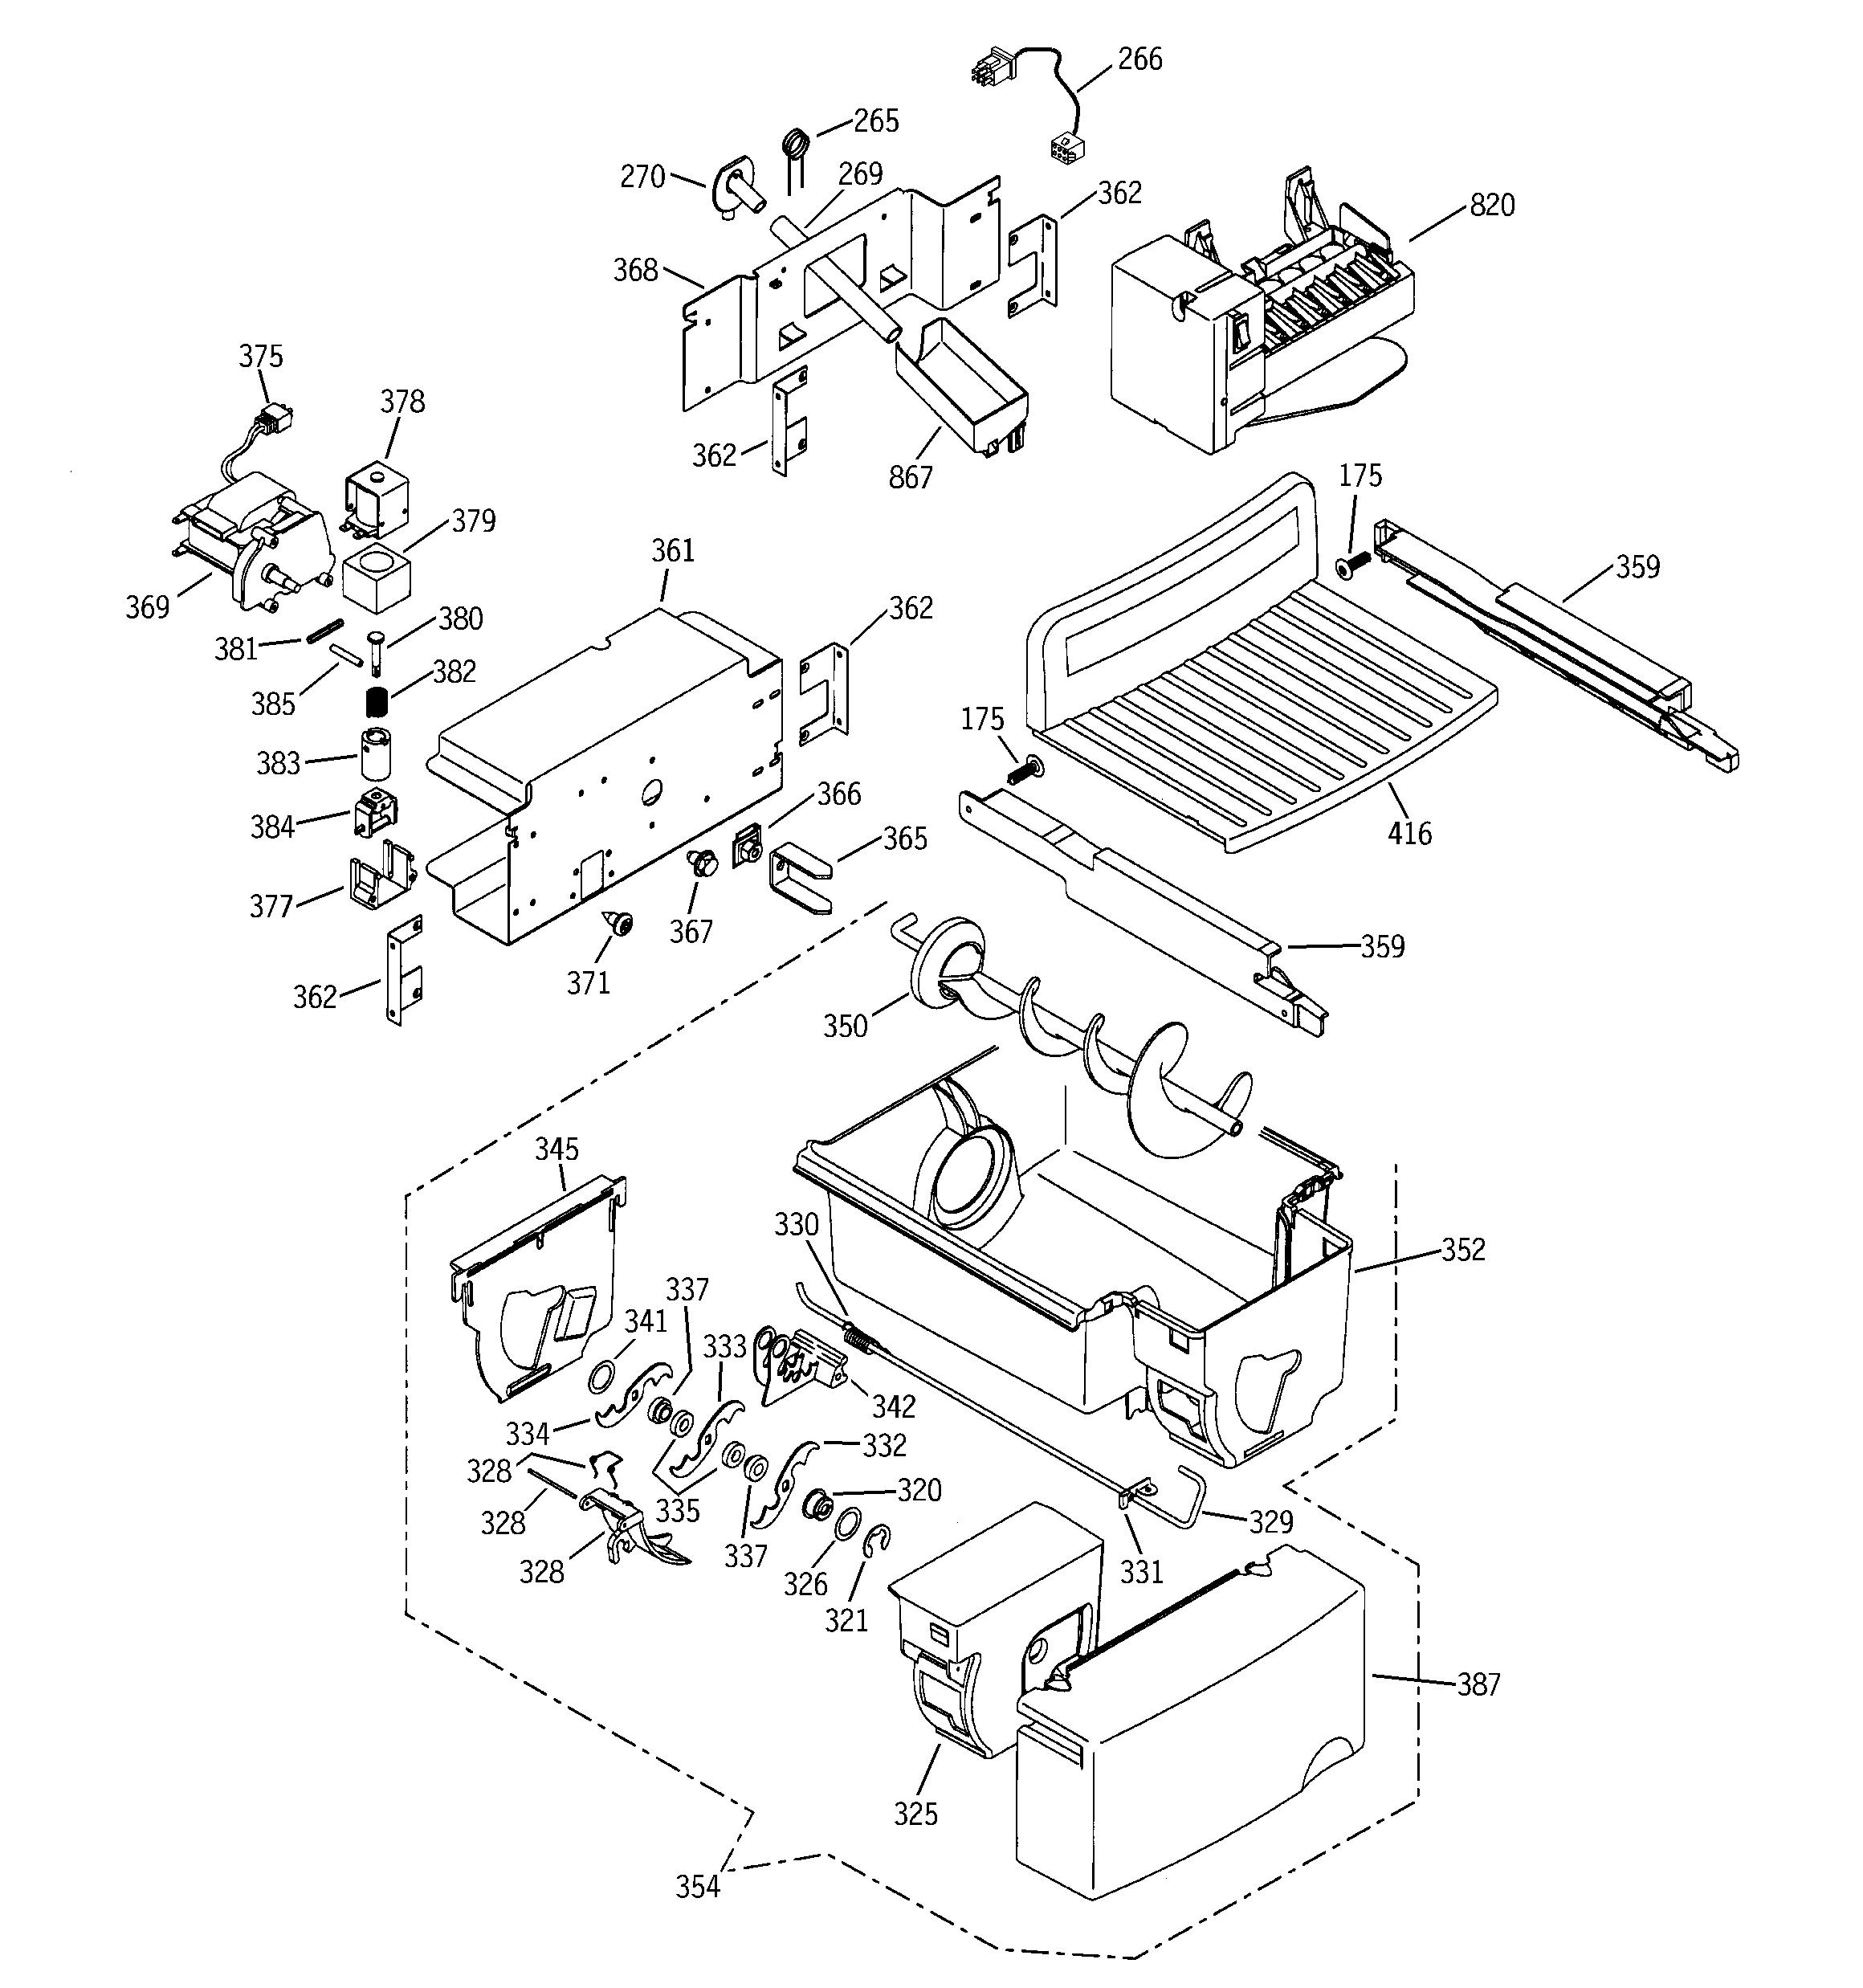 [SCHEMATICS_44OR]  Ge Profile Ice Maker Wiring - Wiring Diagrams | Sxs Ge Fridge Ice Maker Wiring Diagram |  | bite.sea.lesvignoblesguimberteau.fr